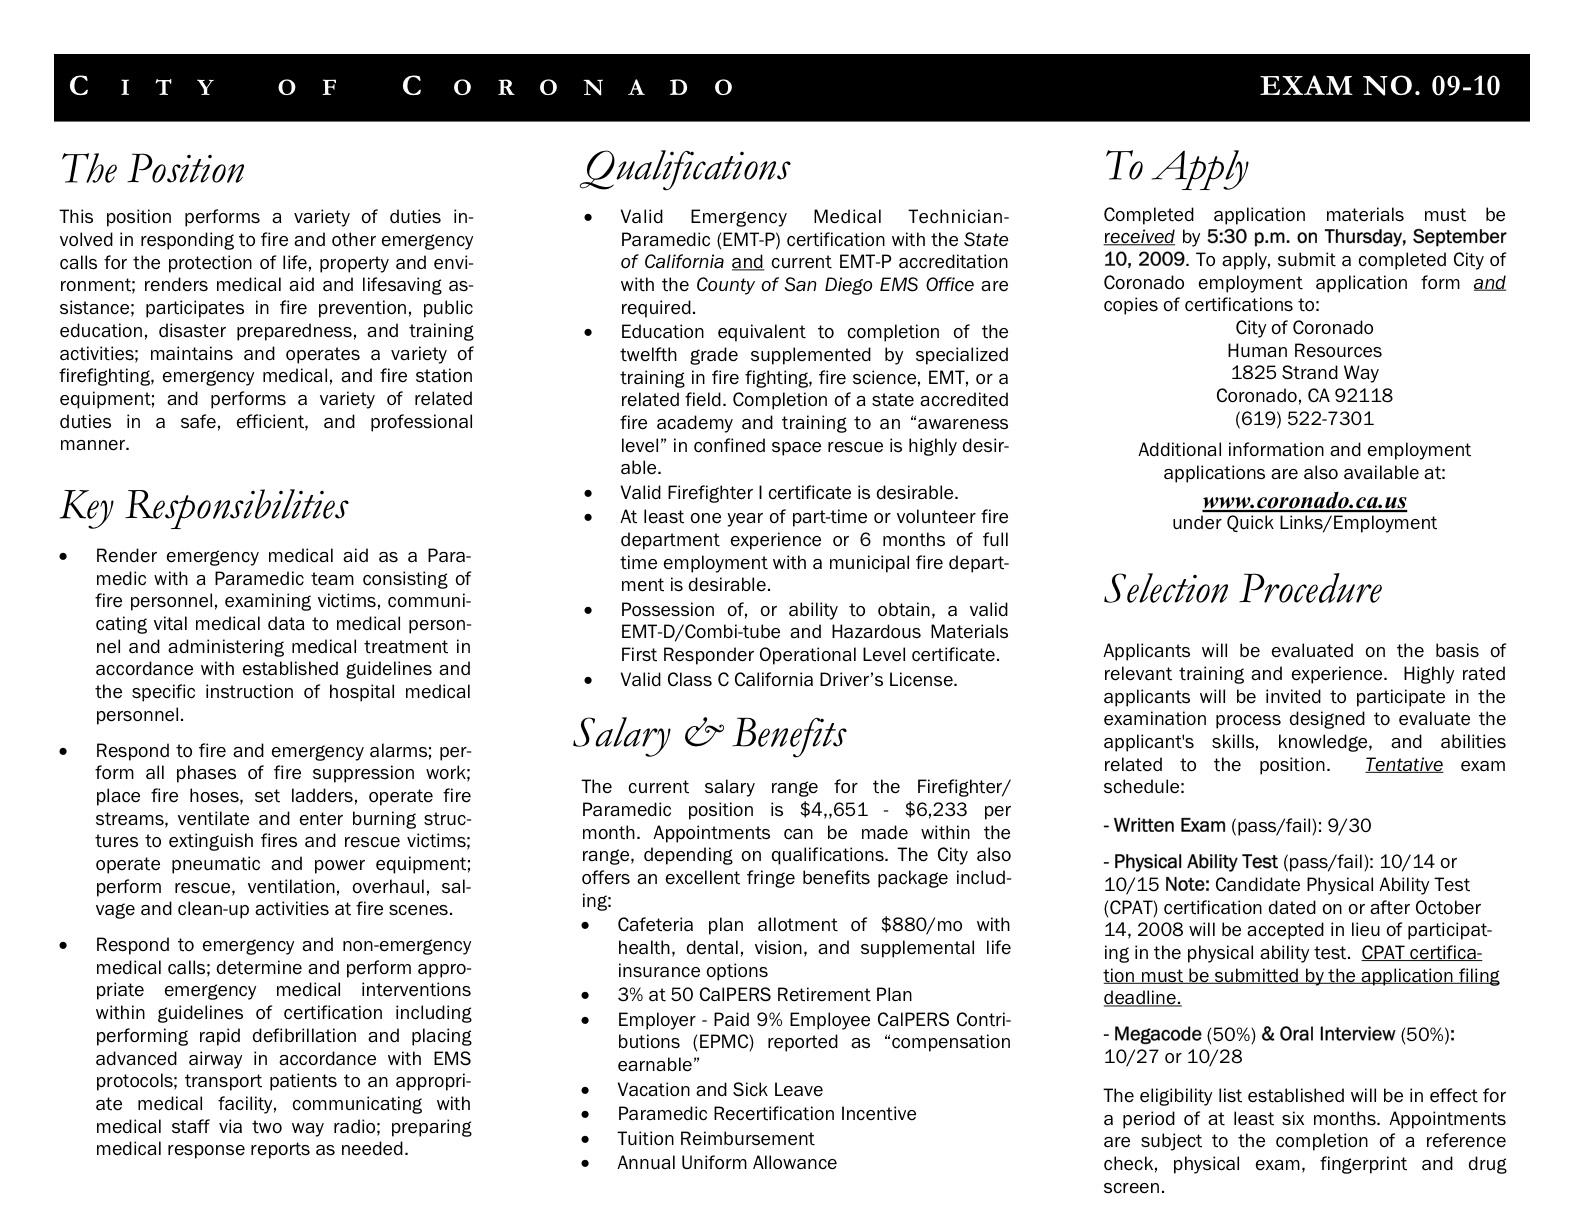 Opening For Firefighterparamedic Position Coronado Common Sense